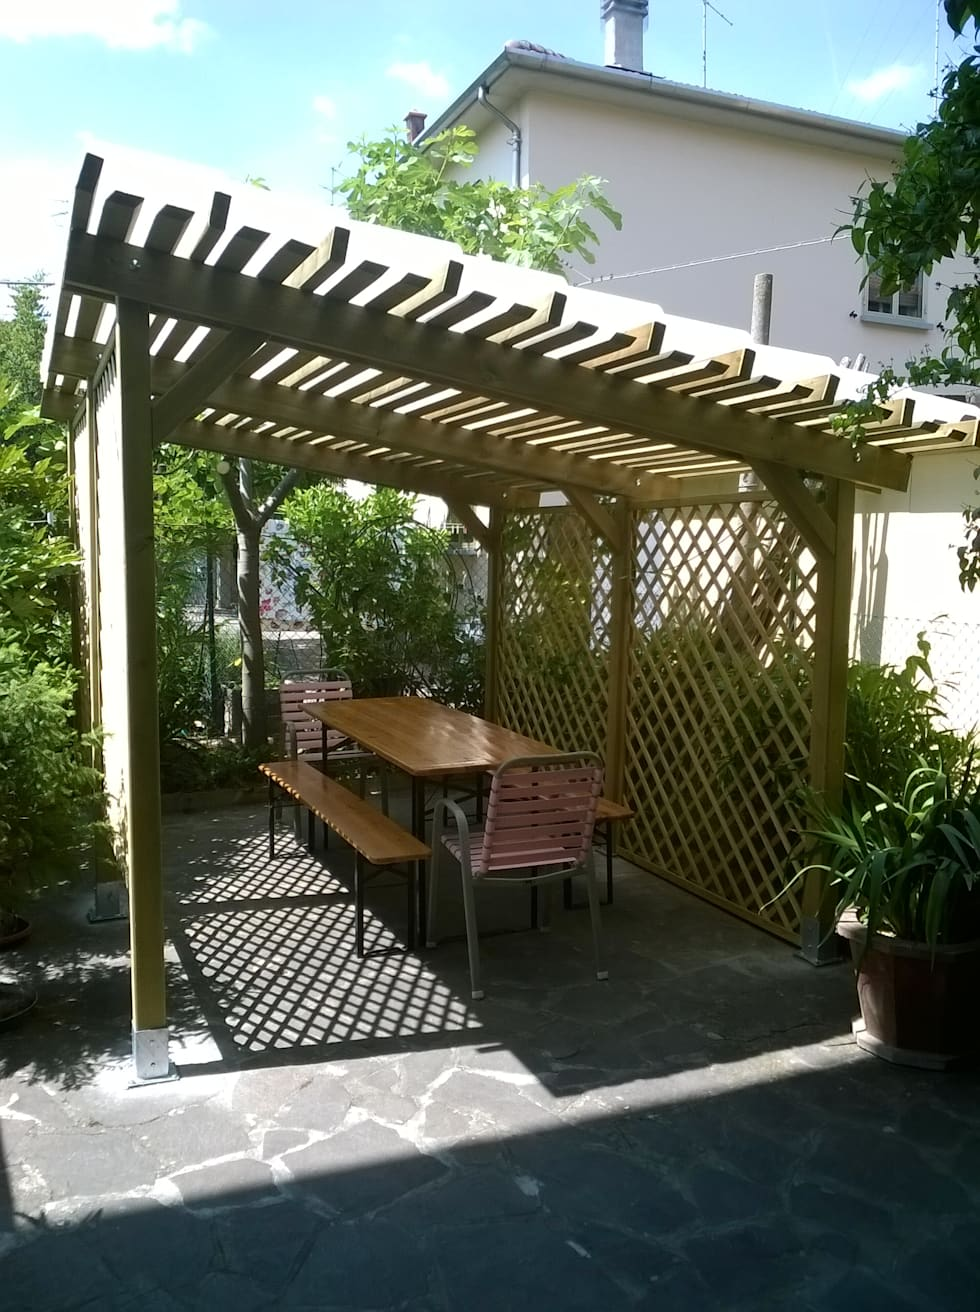 Coppi traslucidi trasparenti su pergola in giardino: Giardino in stile In stile Country di ONLYWOOD